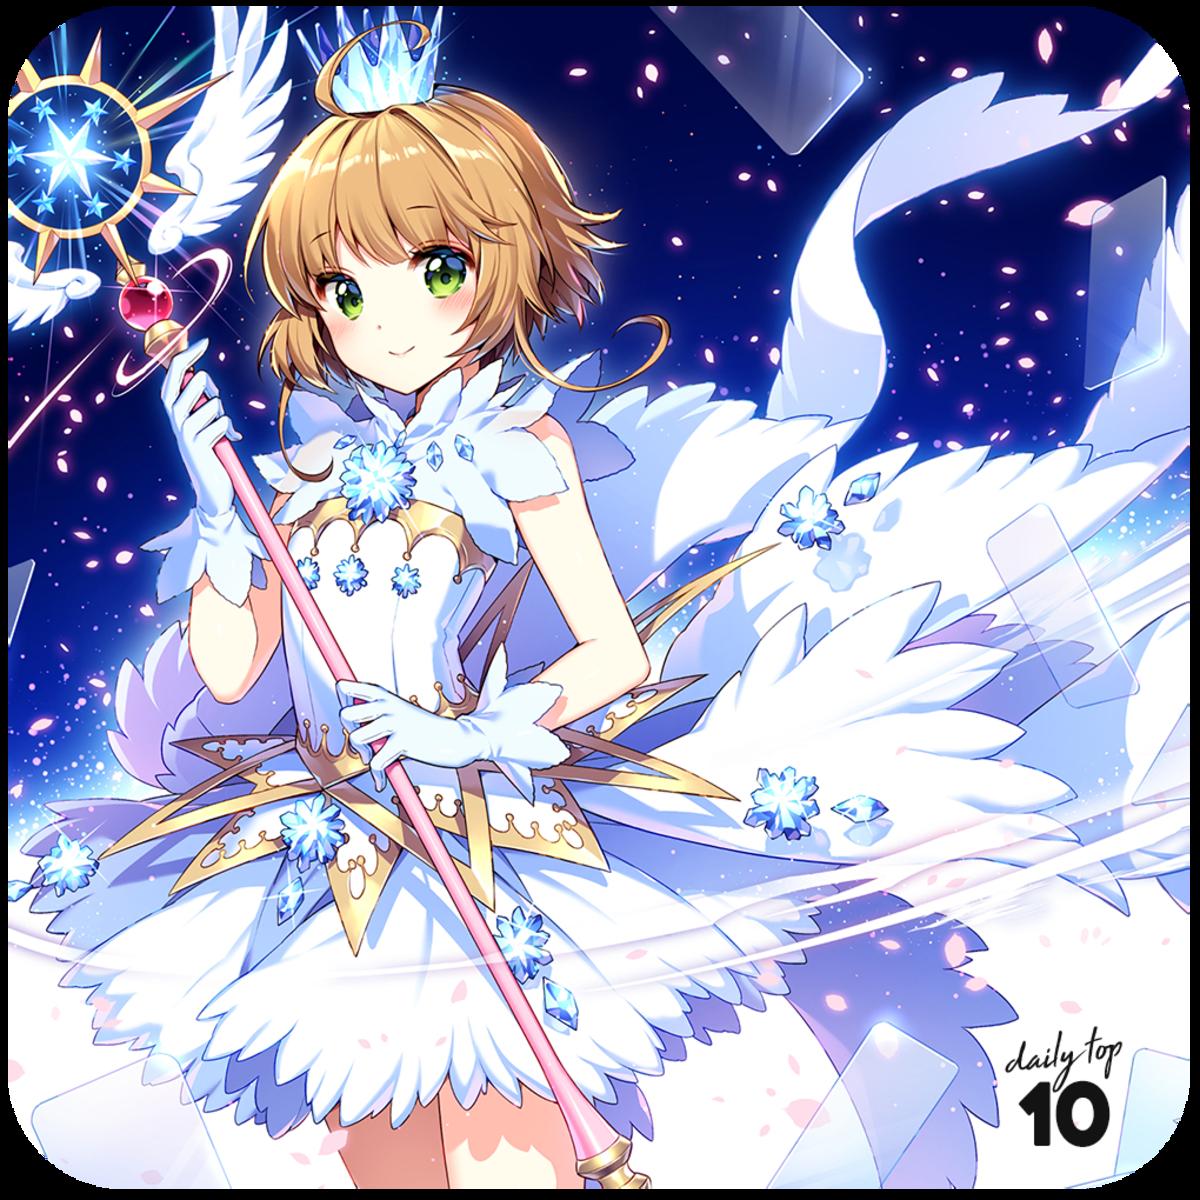 Sakura wearing an angelic costume.